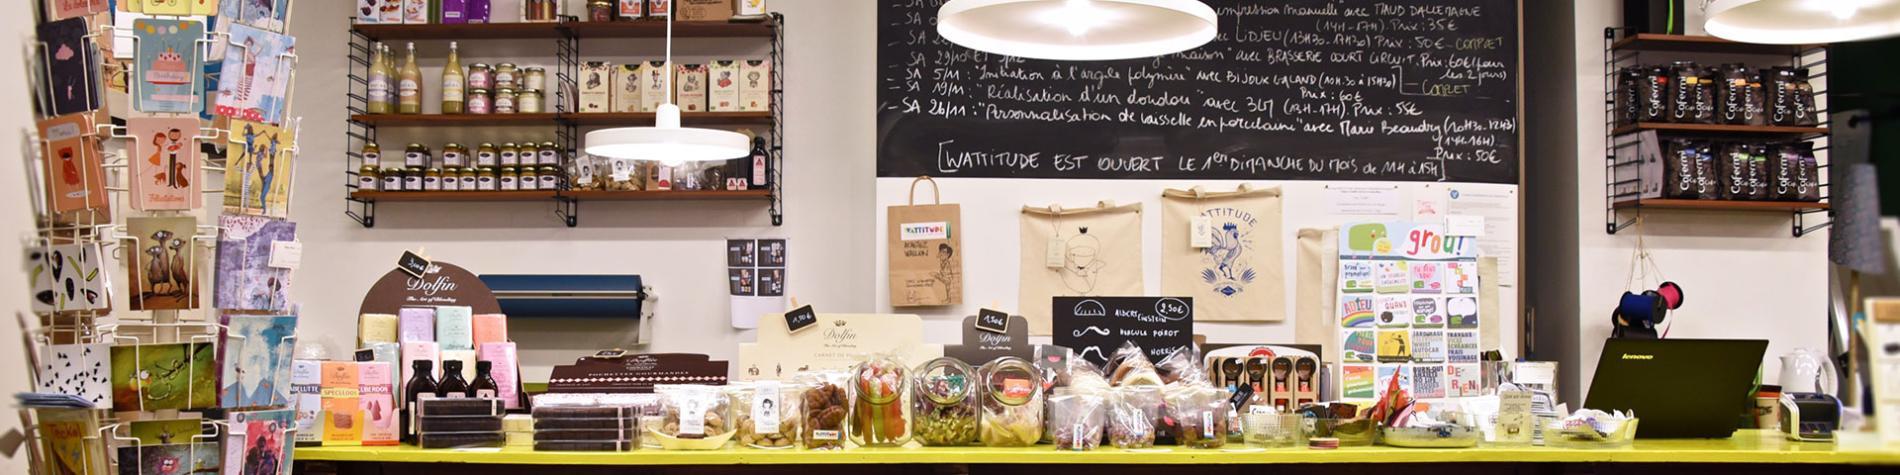 Wattitude - boutique - design - 100% wallon - Liège